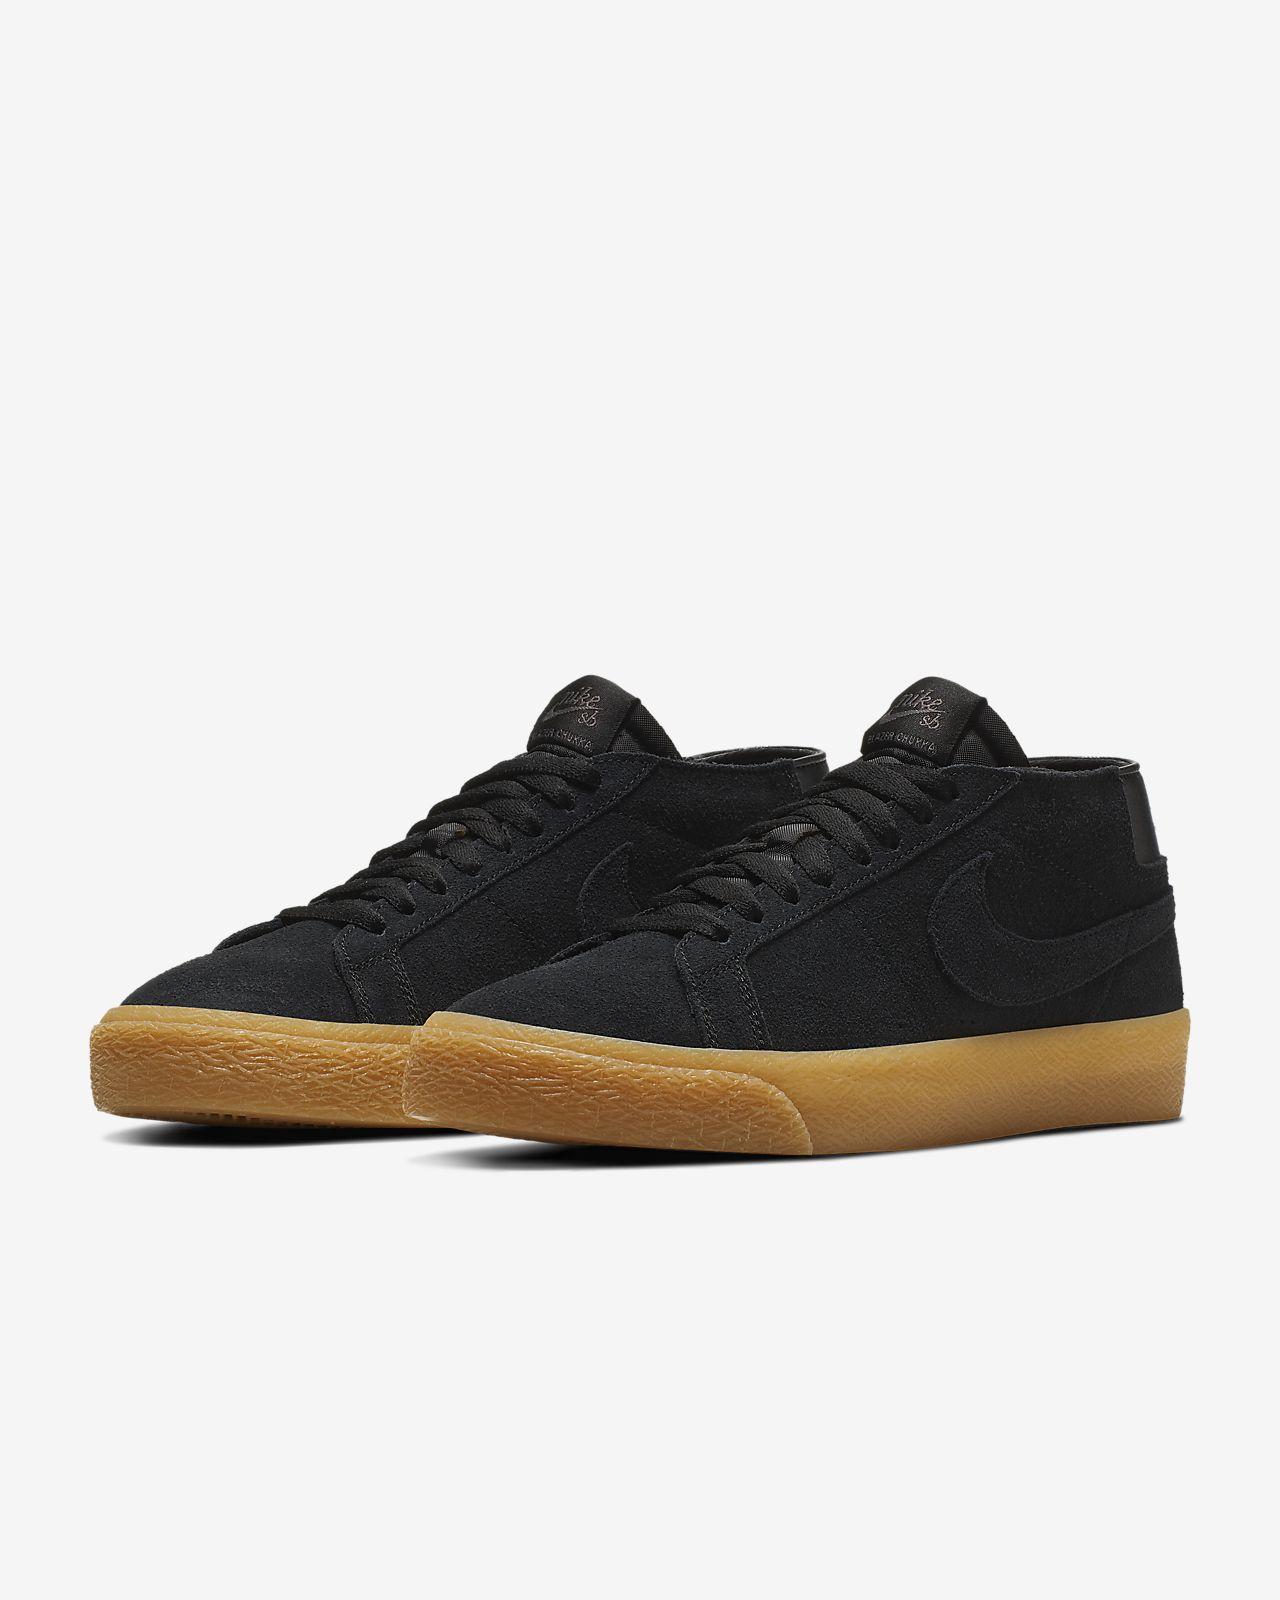 low priced af8dd 24720 ... Nike SB Zoom Blazer Chukka Men s Skate Shoe